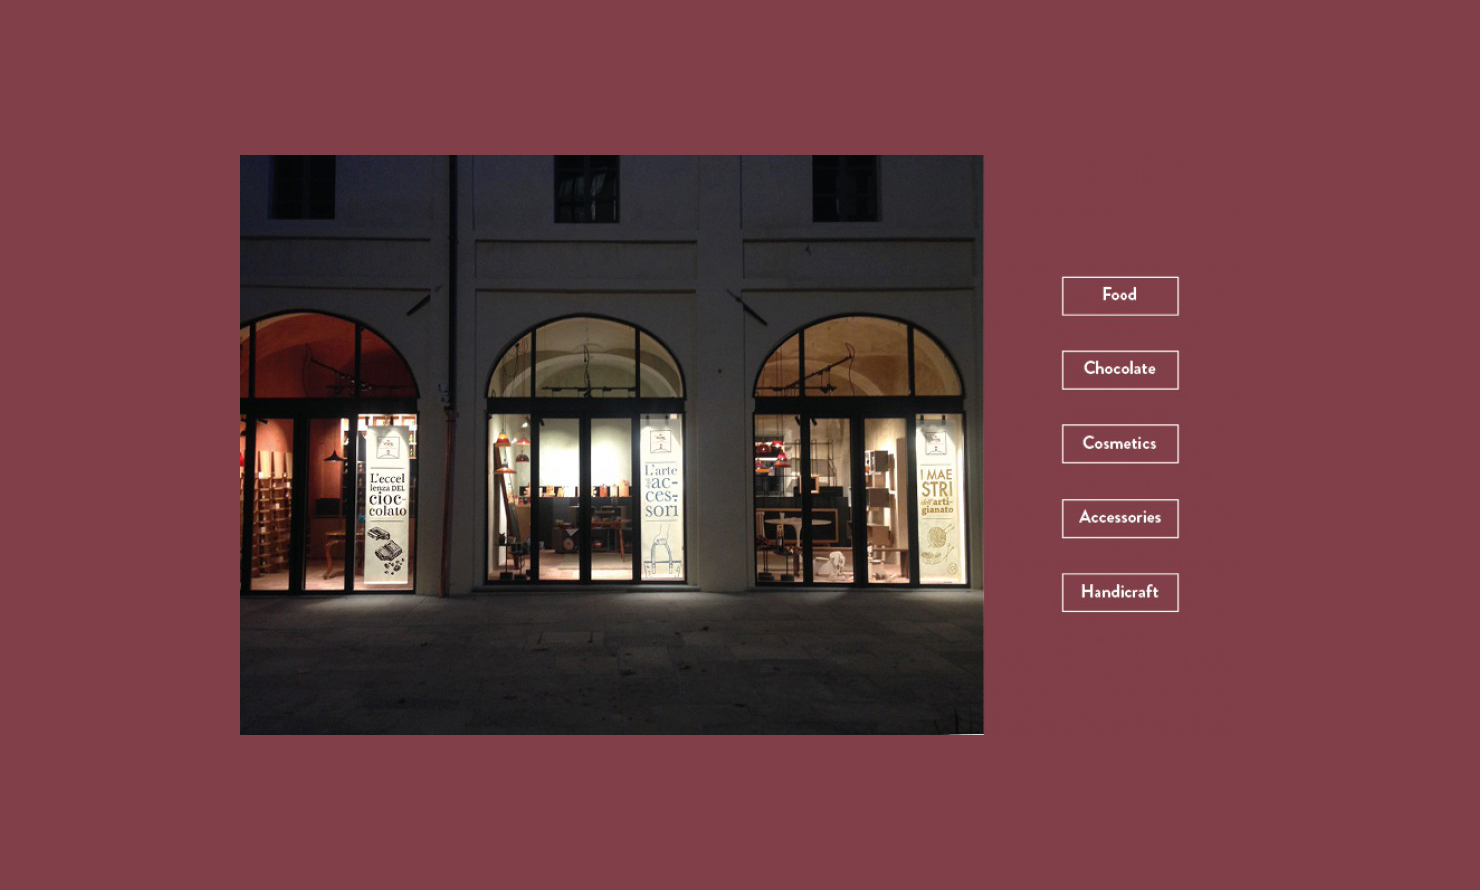 https://www.kubelibre.com/uploads/Slider-work-tutti-clienti/manital-vistaterra-la-corte-dei-mercanti-le-botteghe-di-vistaterra-4.jpg